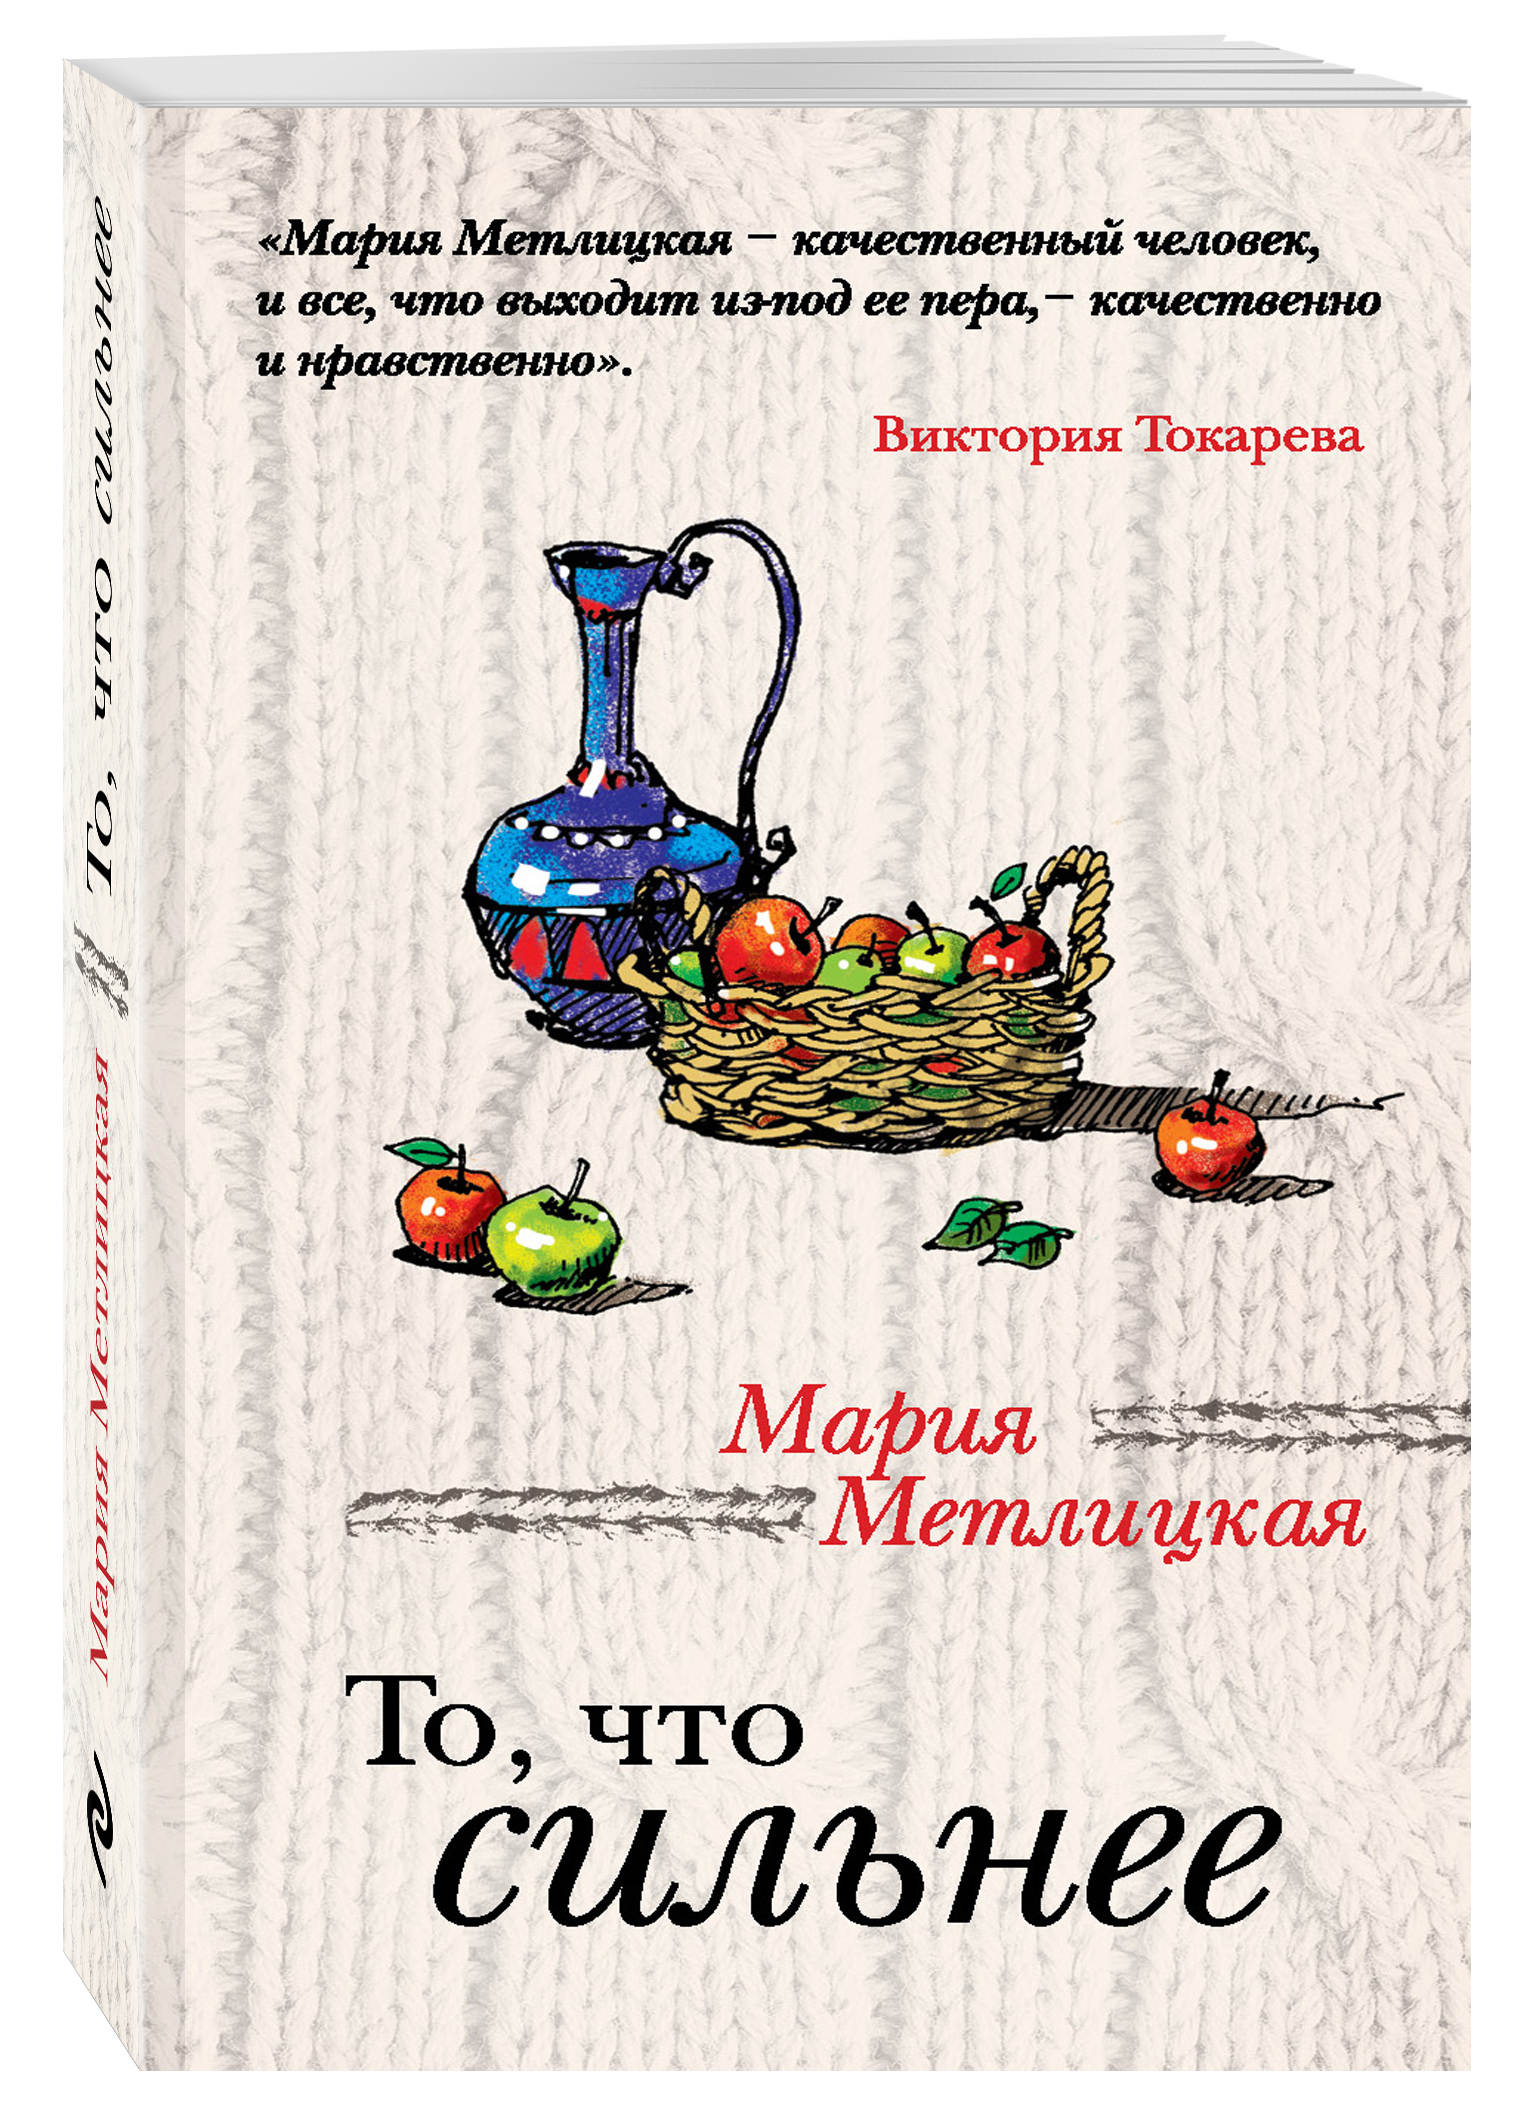 Фото - Мария Метлицкая То, что сильнее мария метлицкая то что сильнее сборник